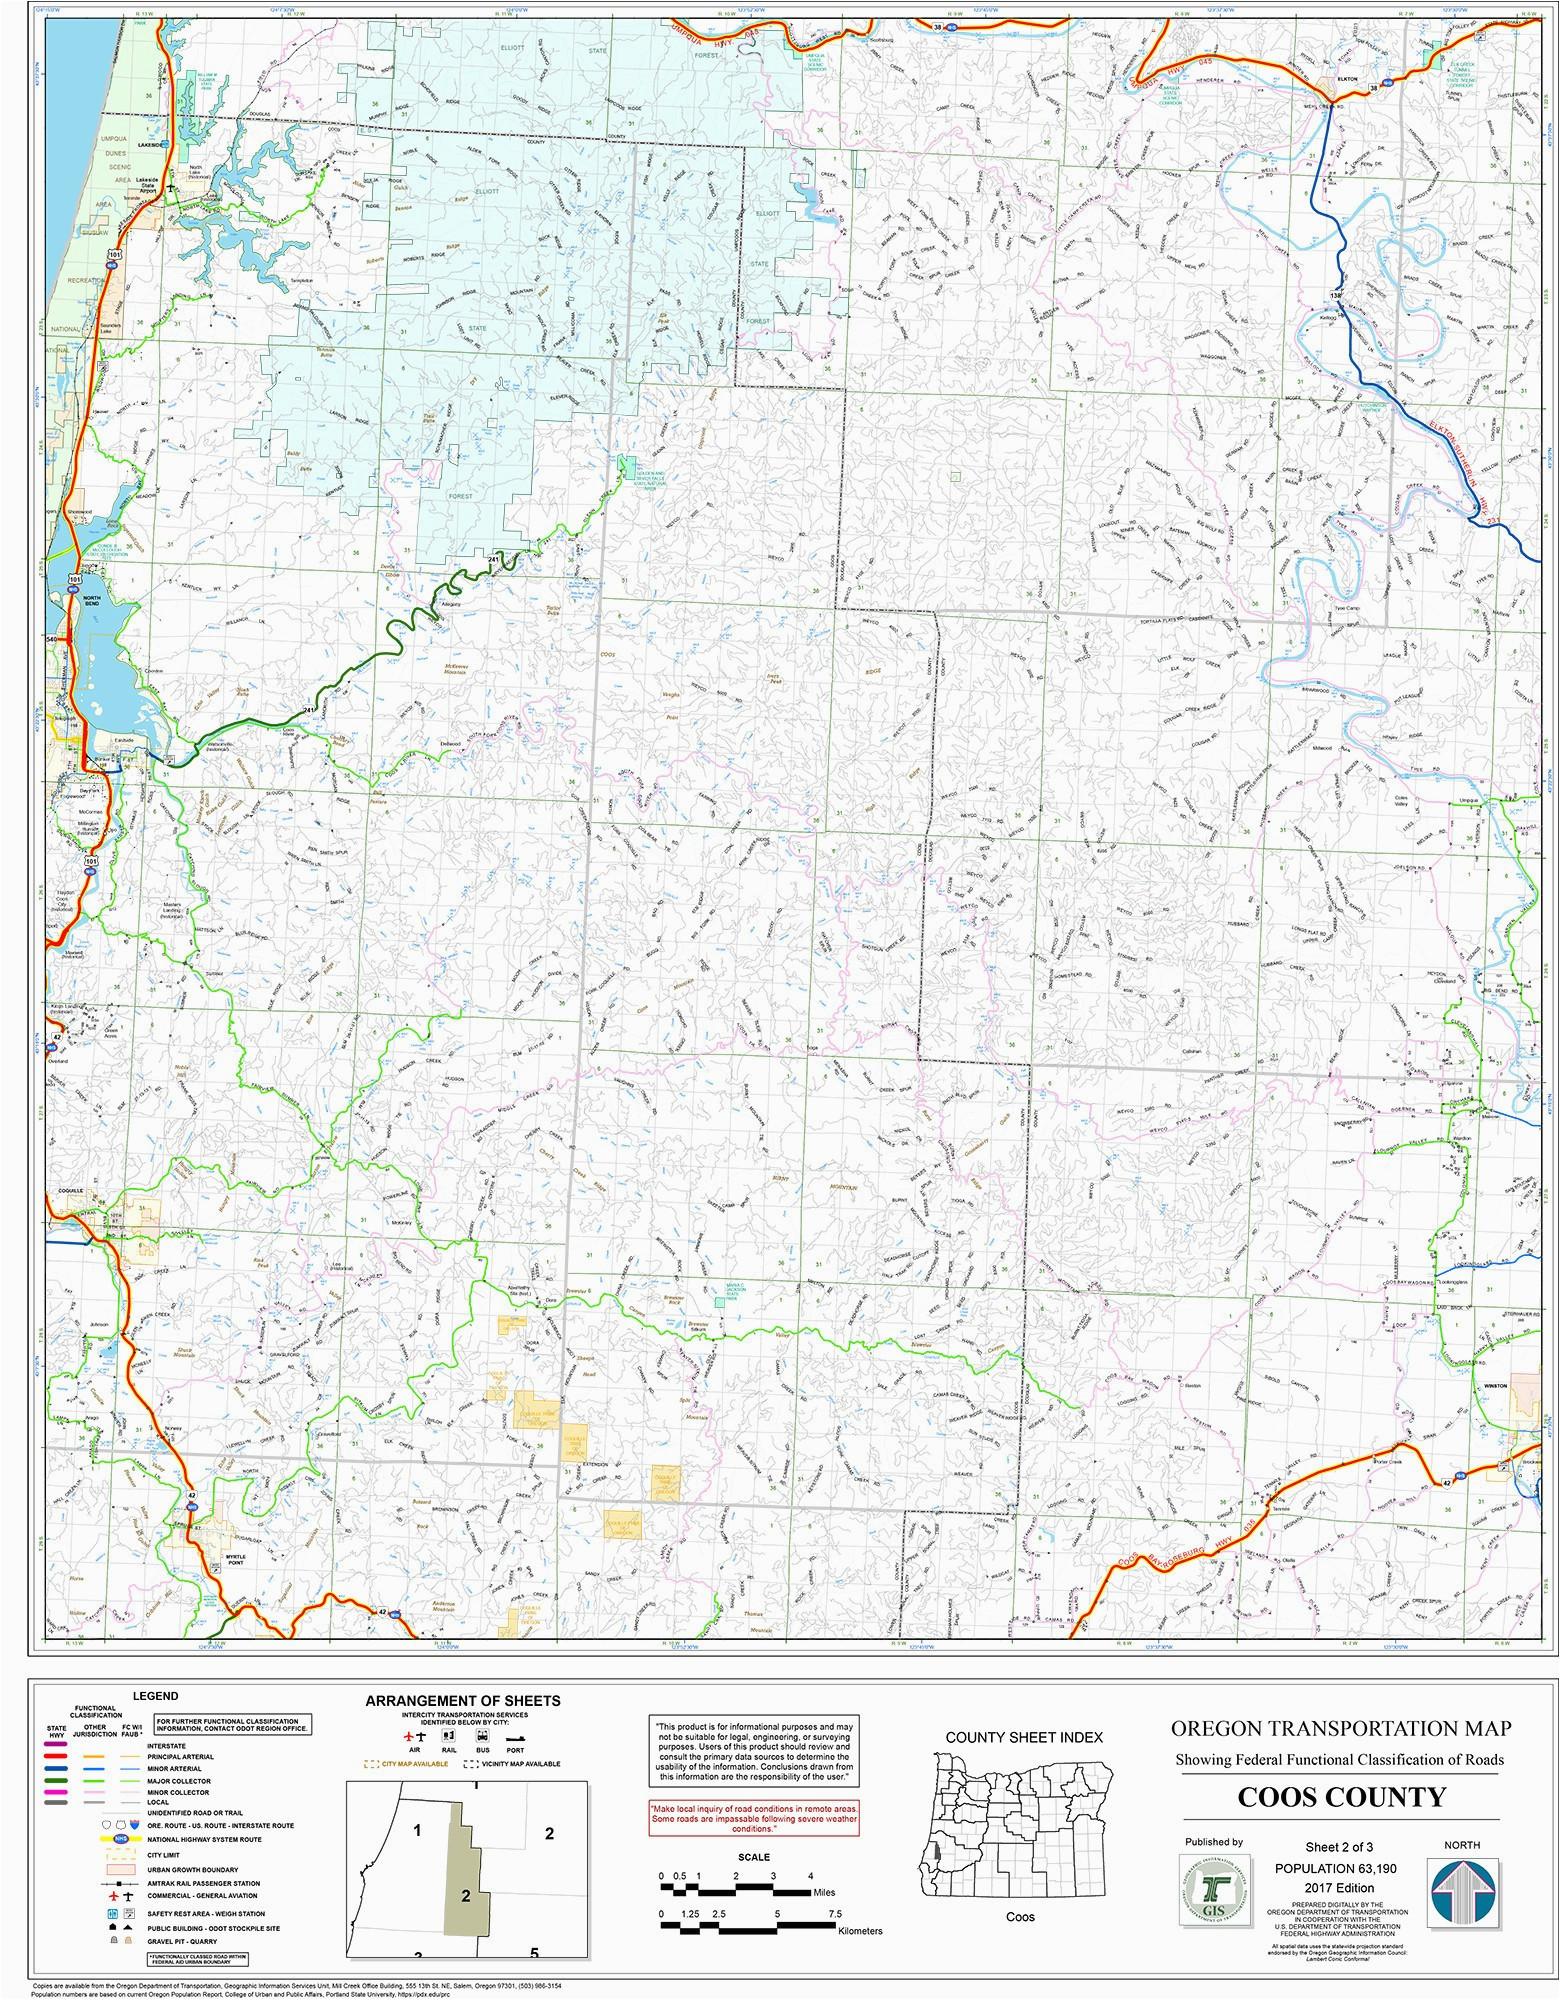 onutc maps driving directions